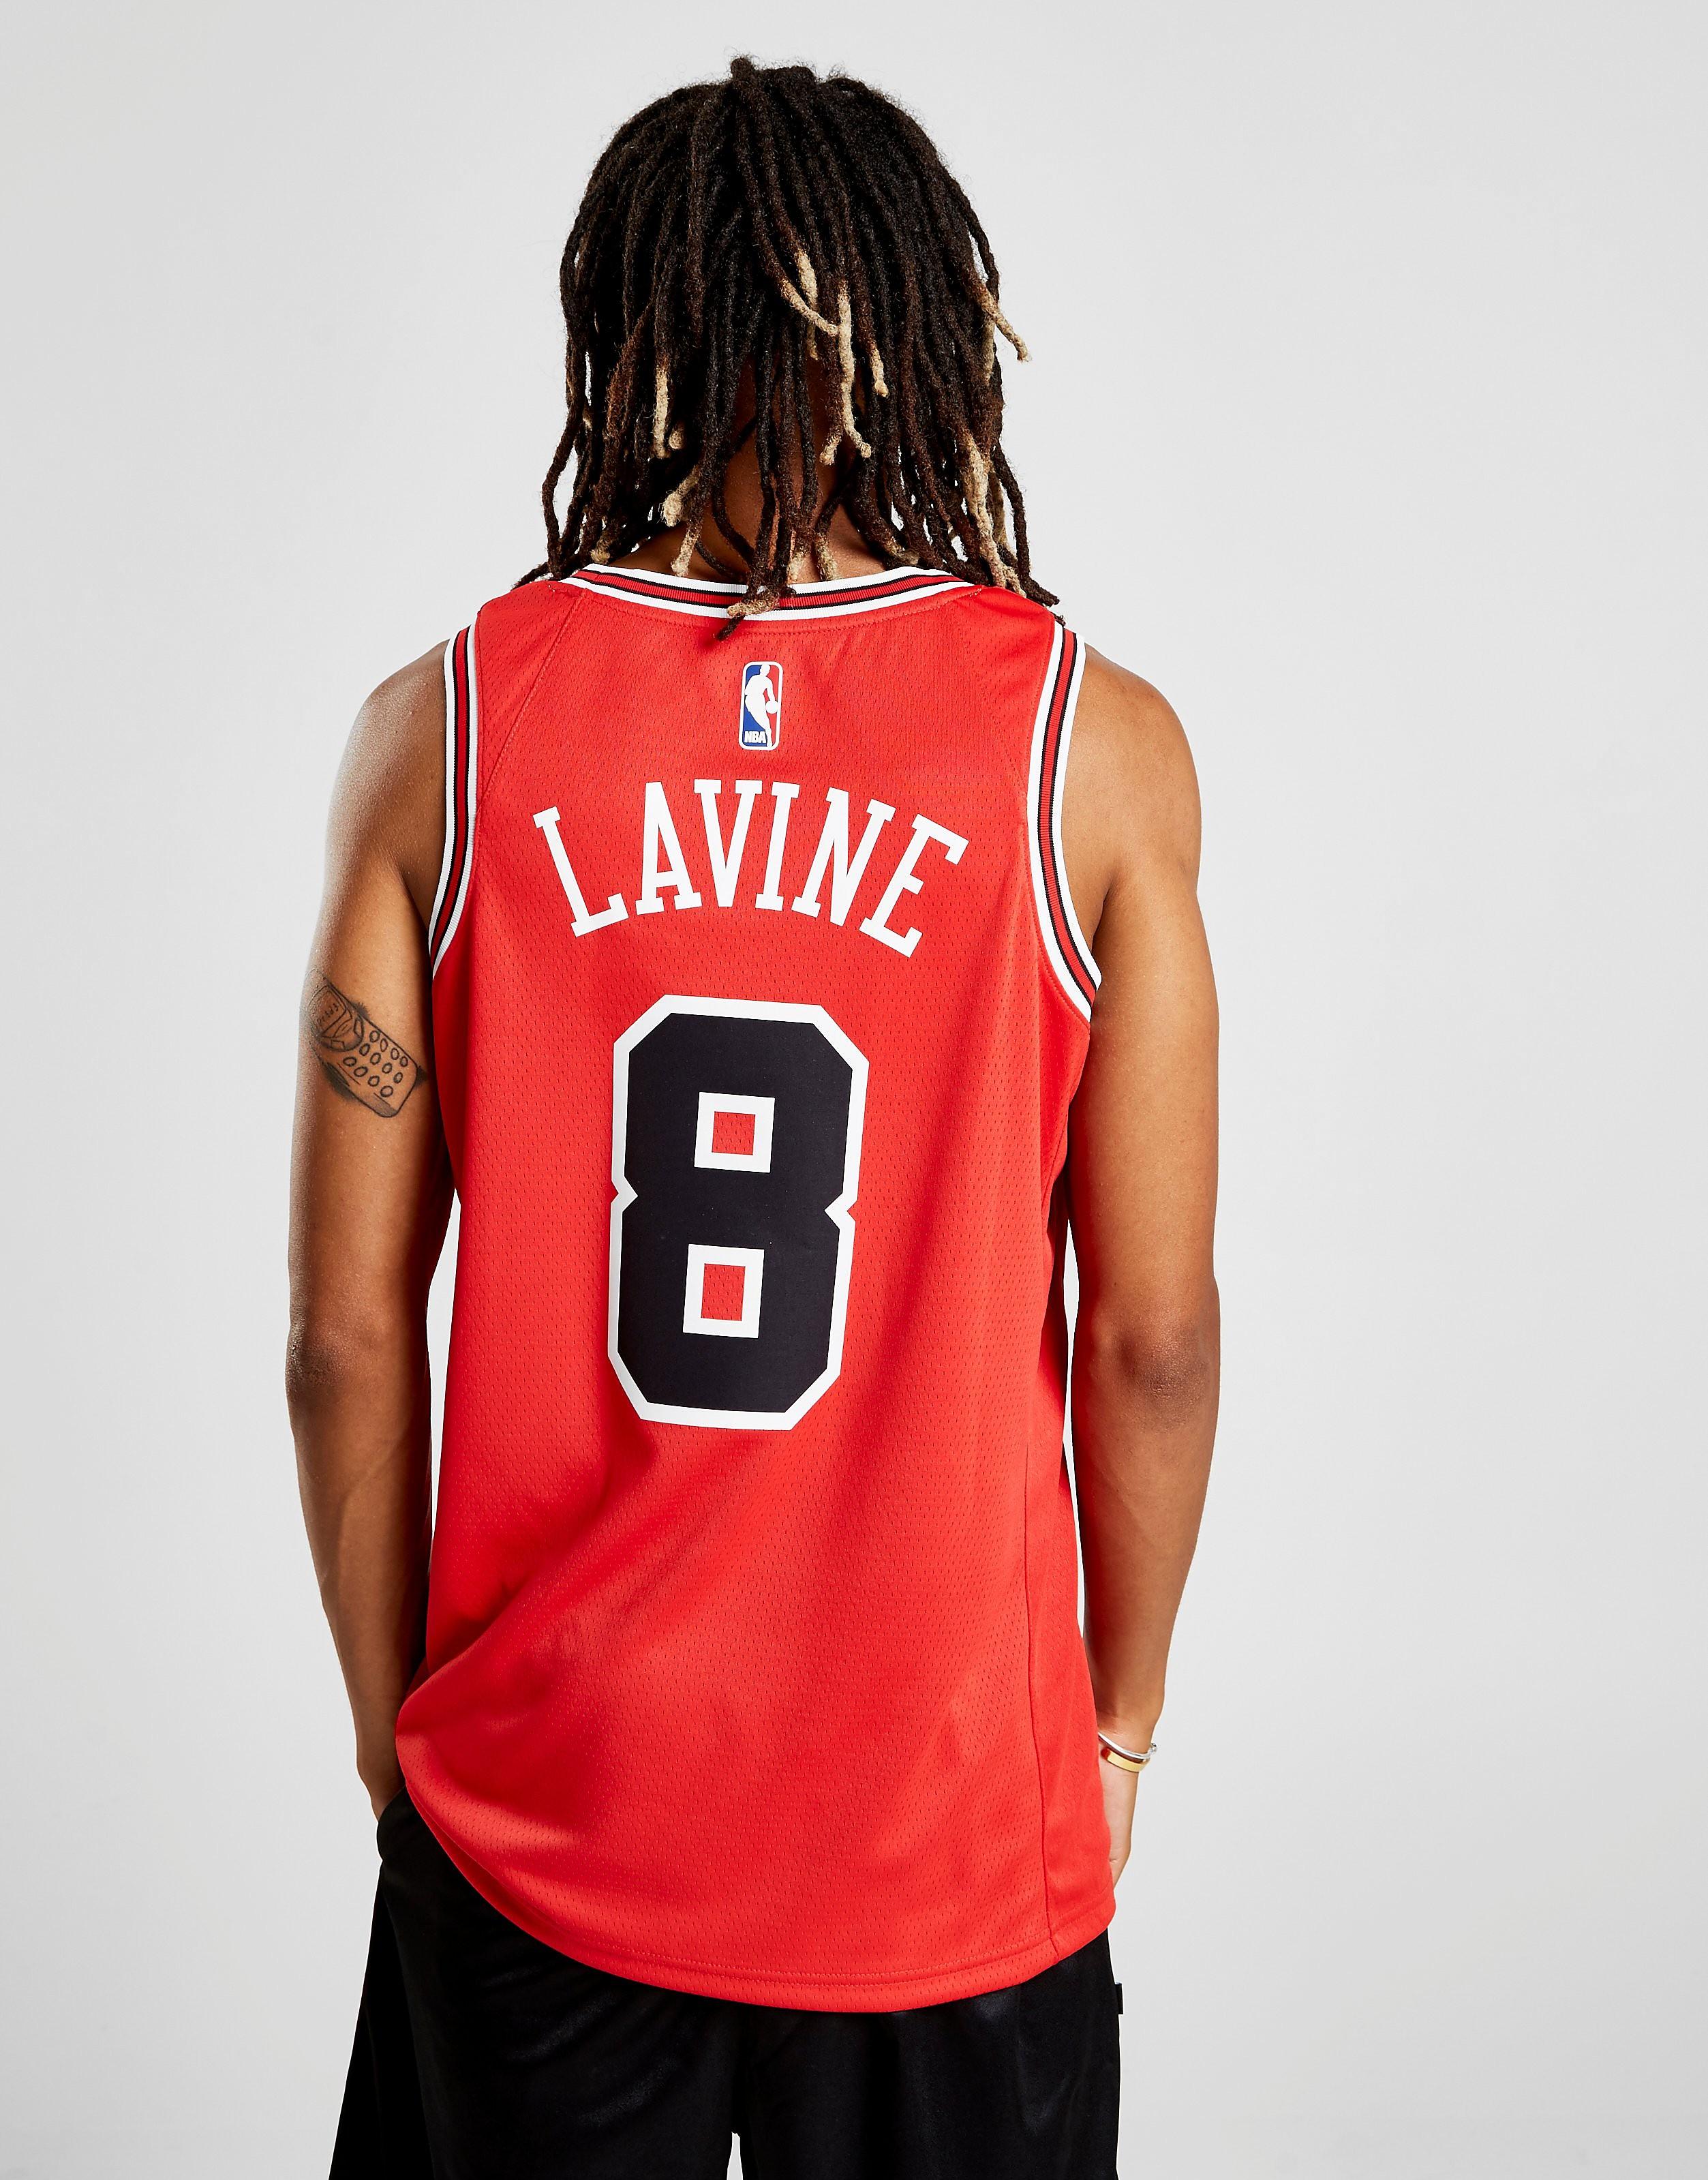 Nike NBA Chicago Bulls Swingman Lavine Jersey